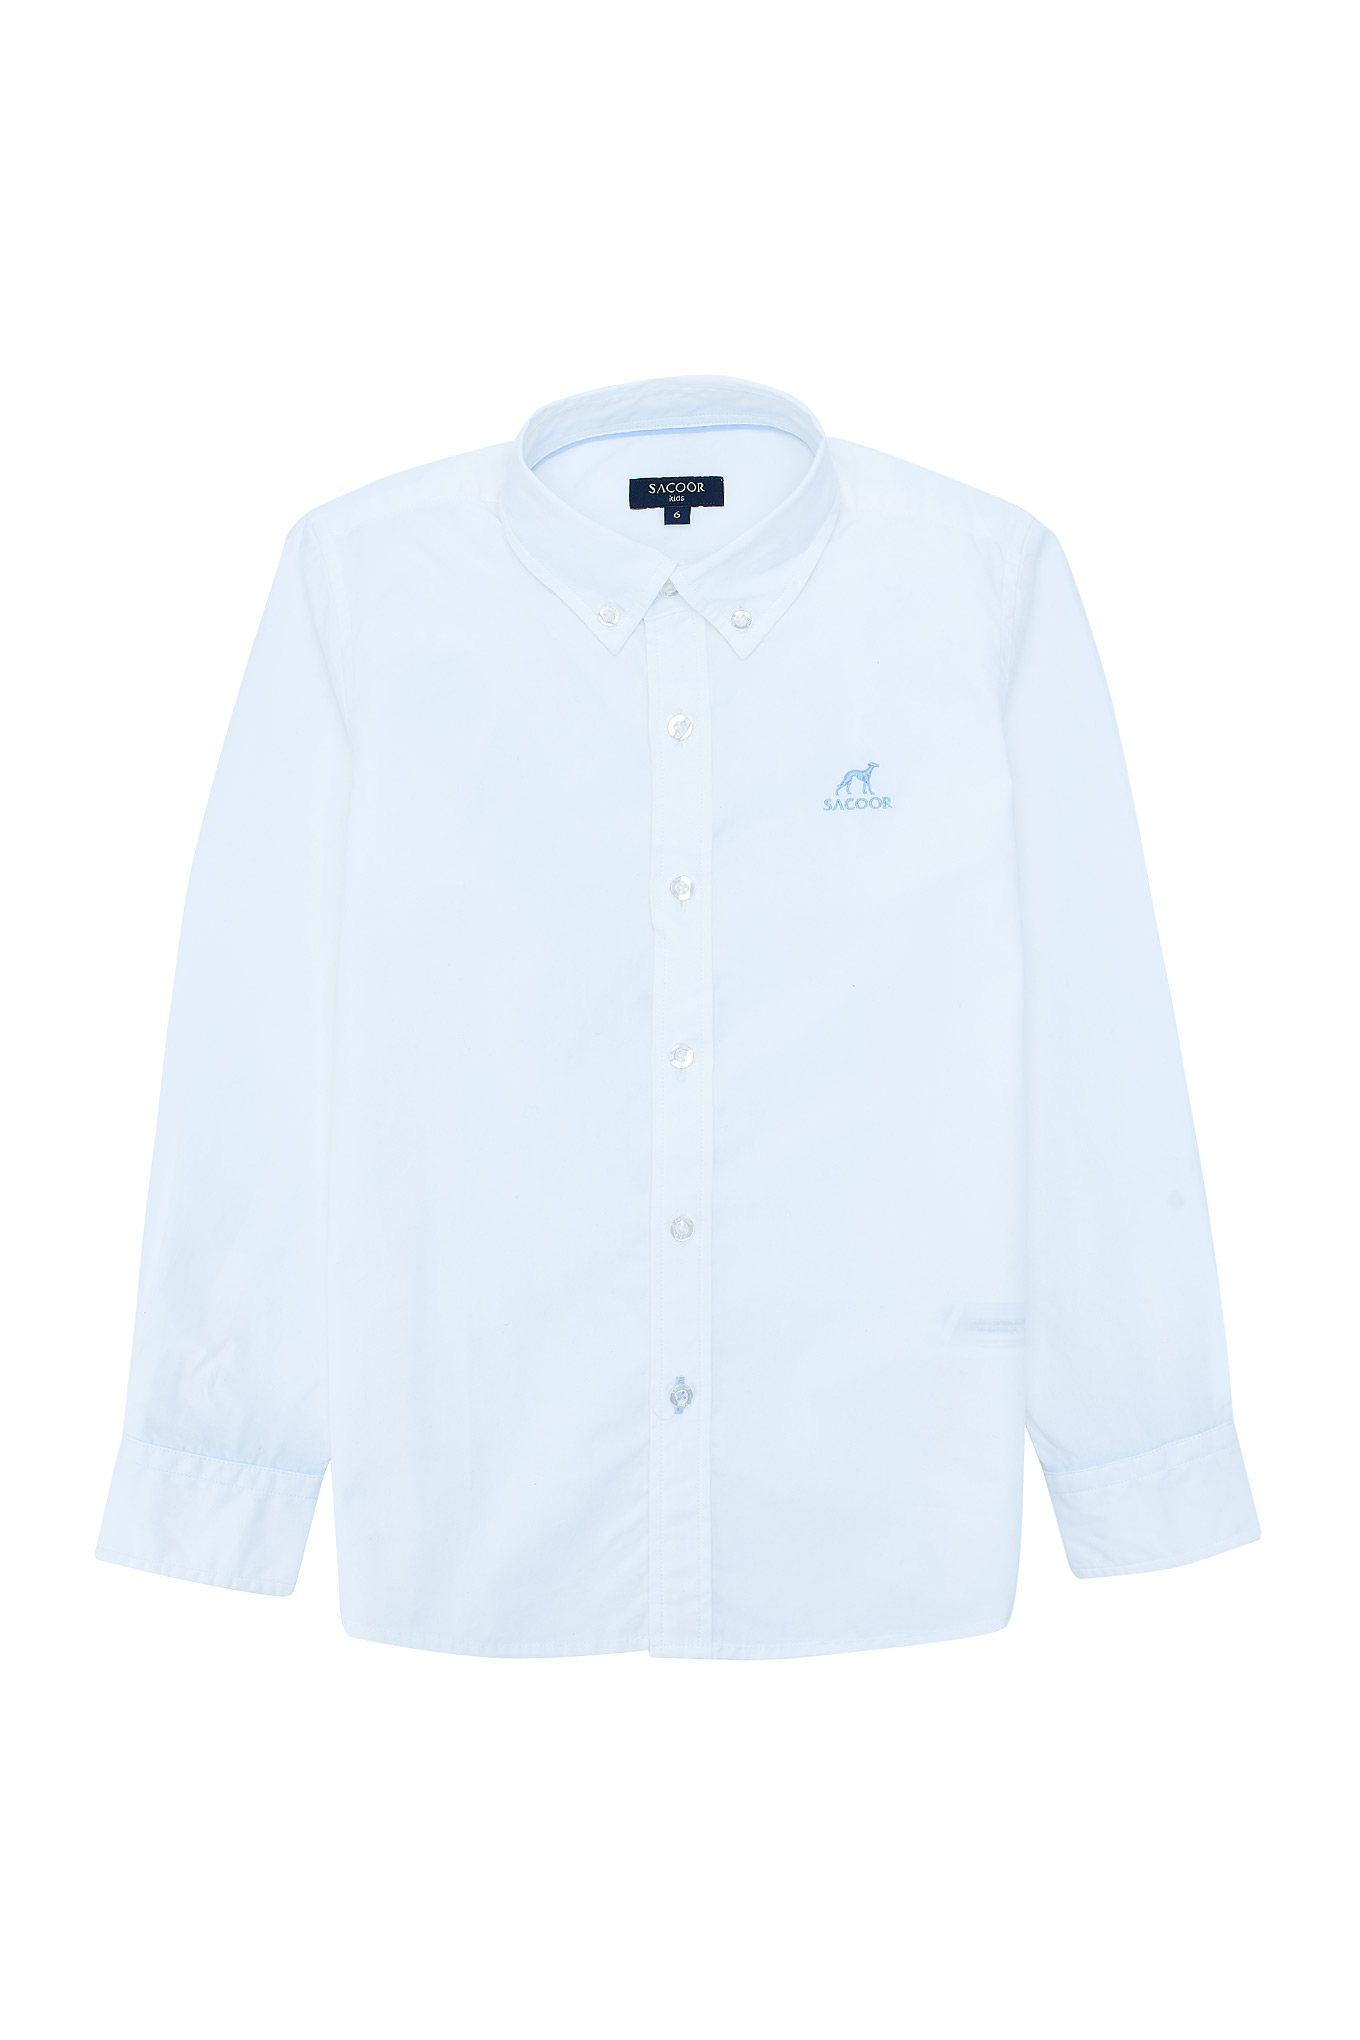 Camisa Branco Classic Rapaz